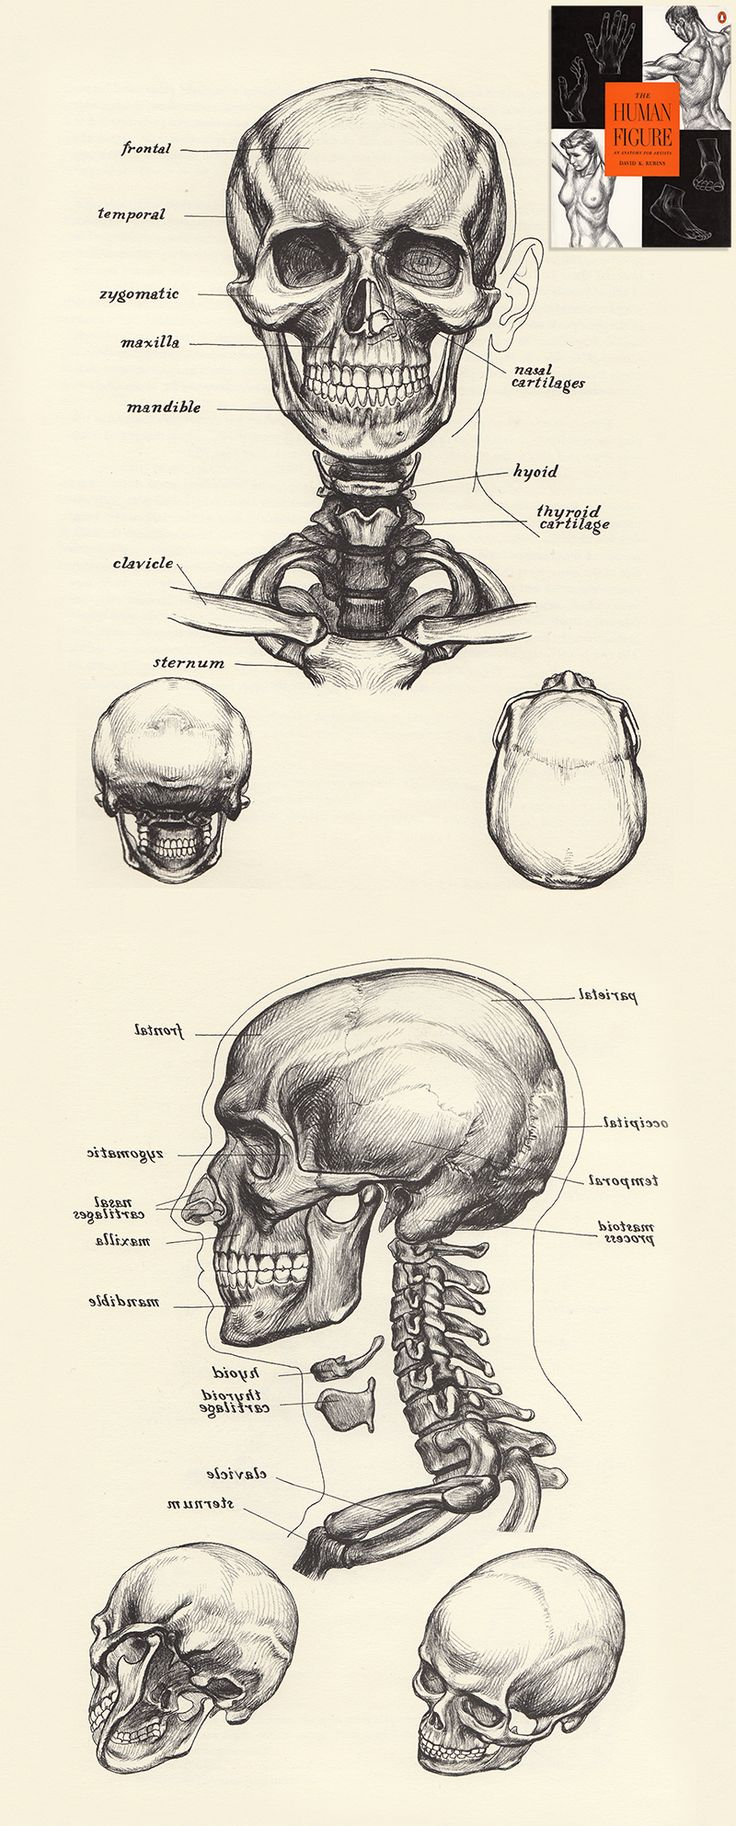 The Human Figure by David K.Rubins: The Skull